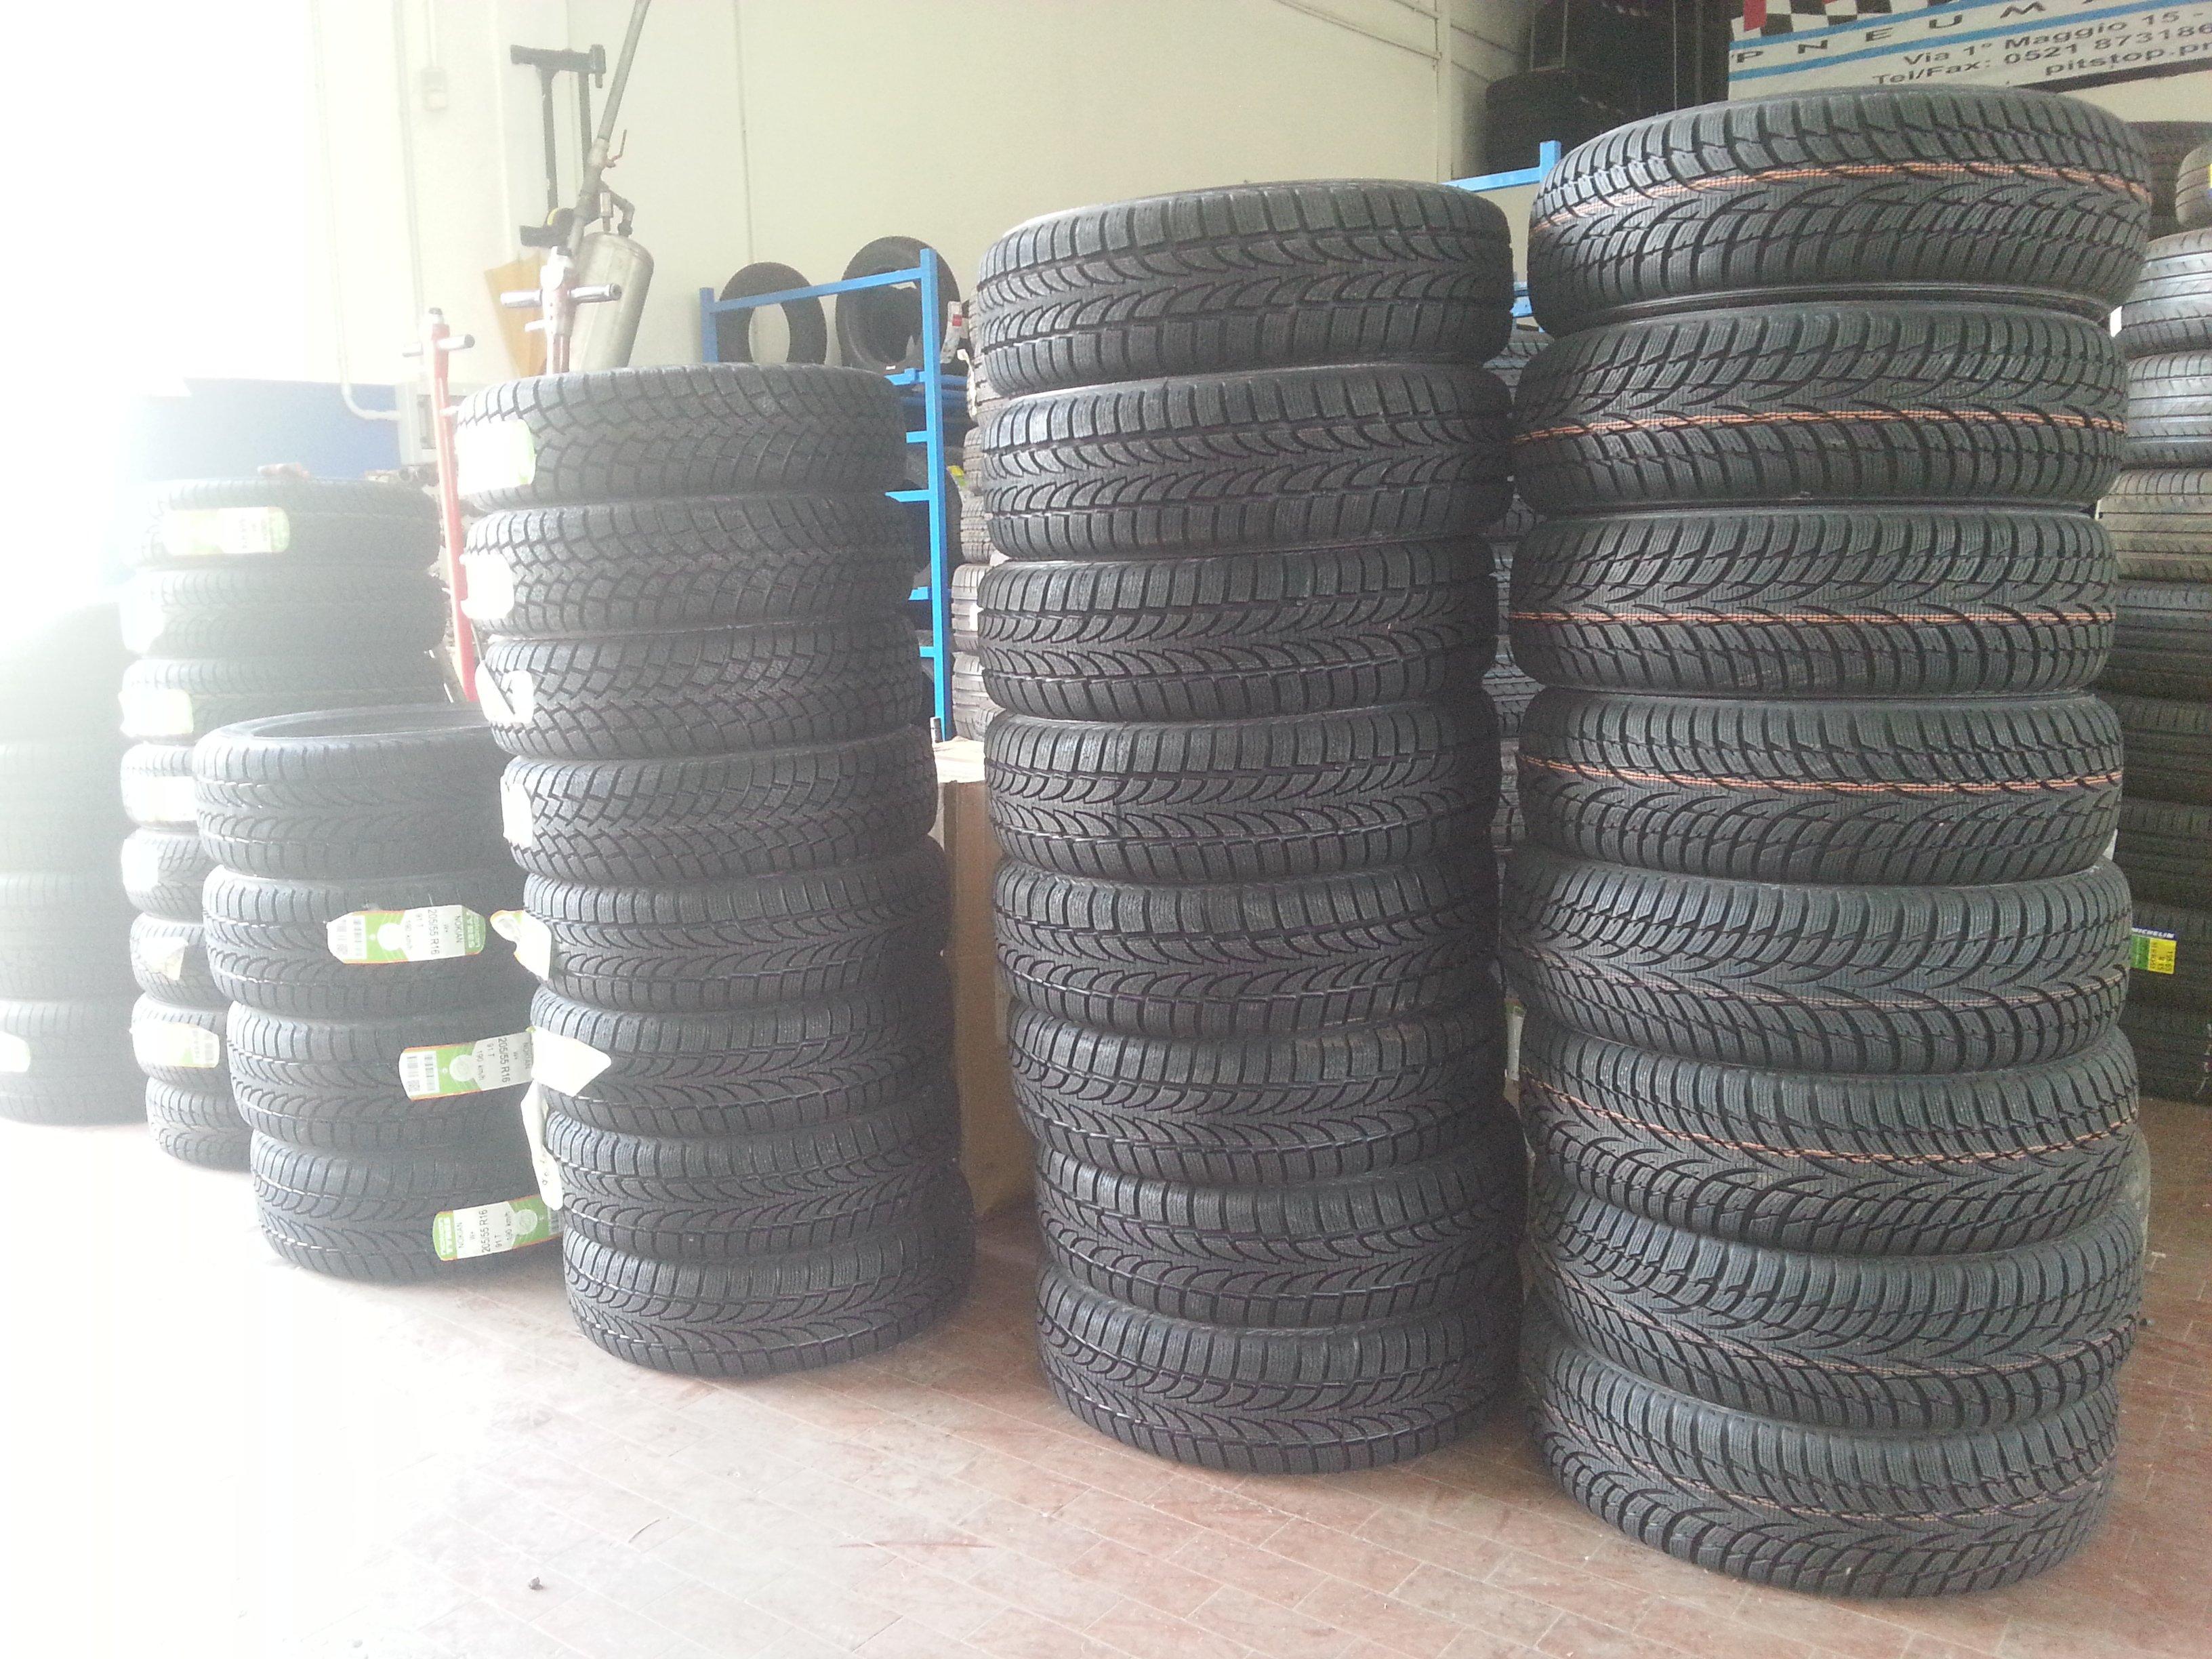 serie di pneumatici disposti a file gli uni sopra gli altri